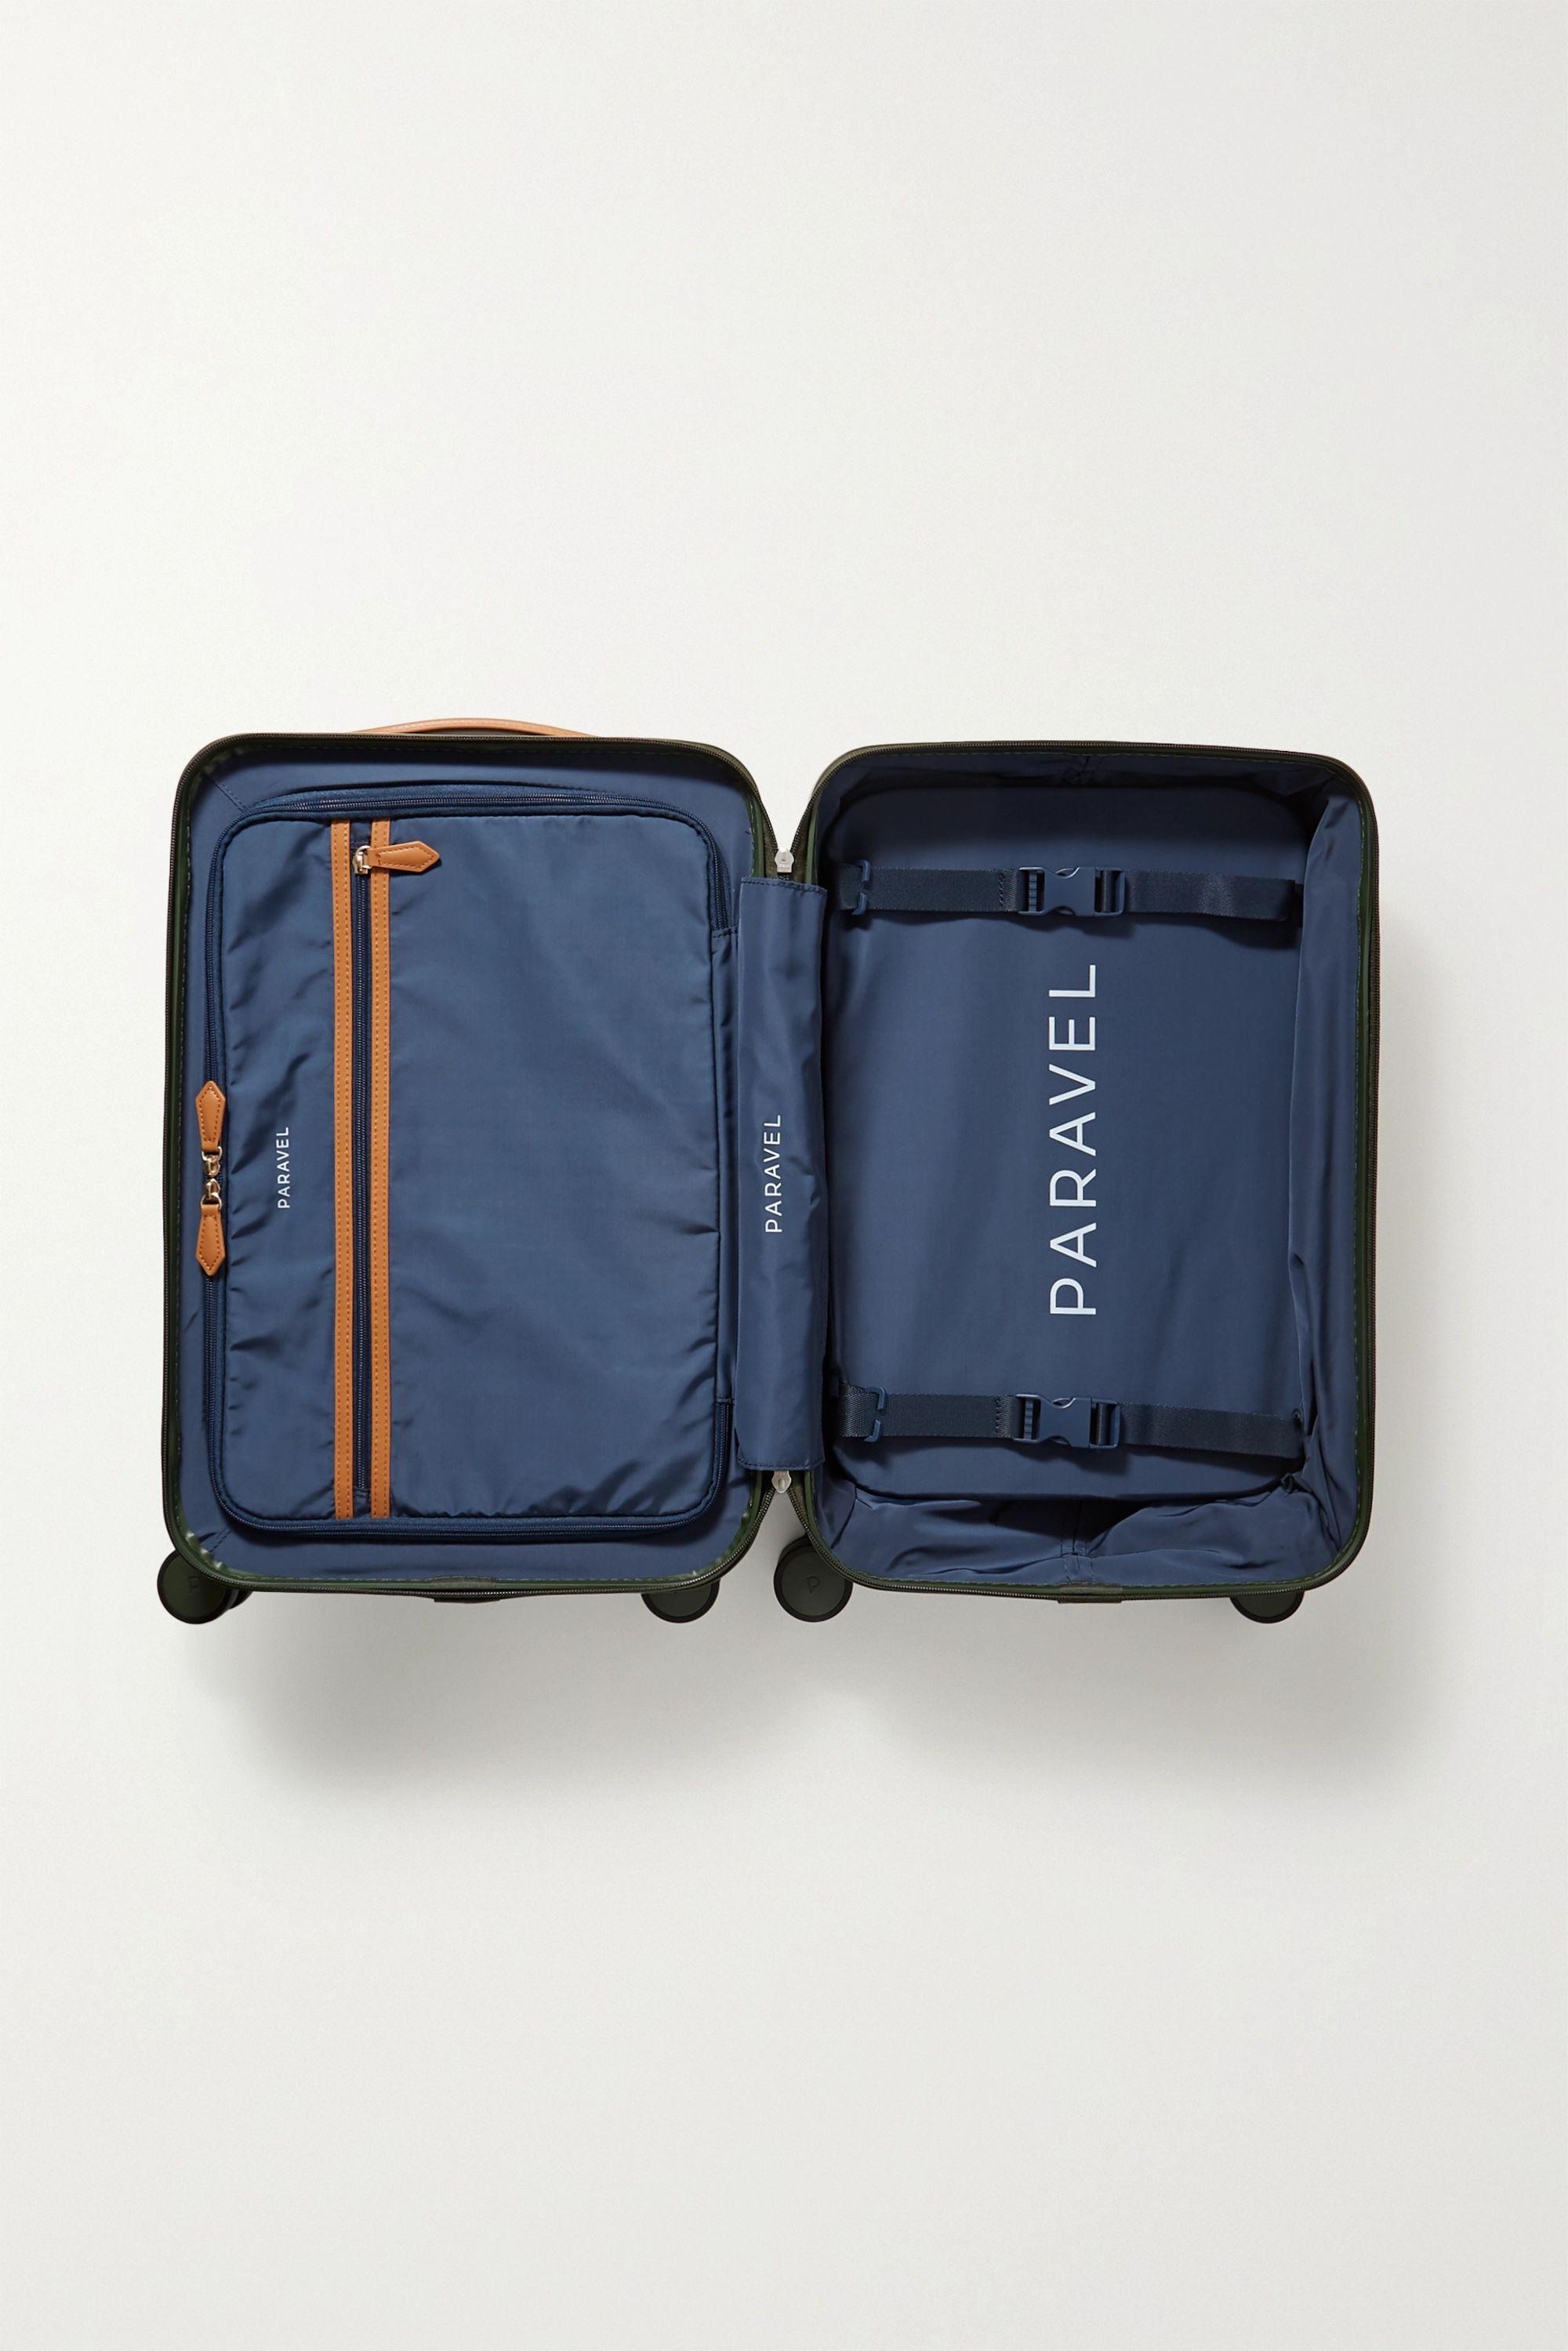 Paravel Aviator faux leather-trimmed hardshell suitcase